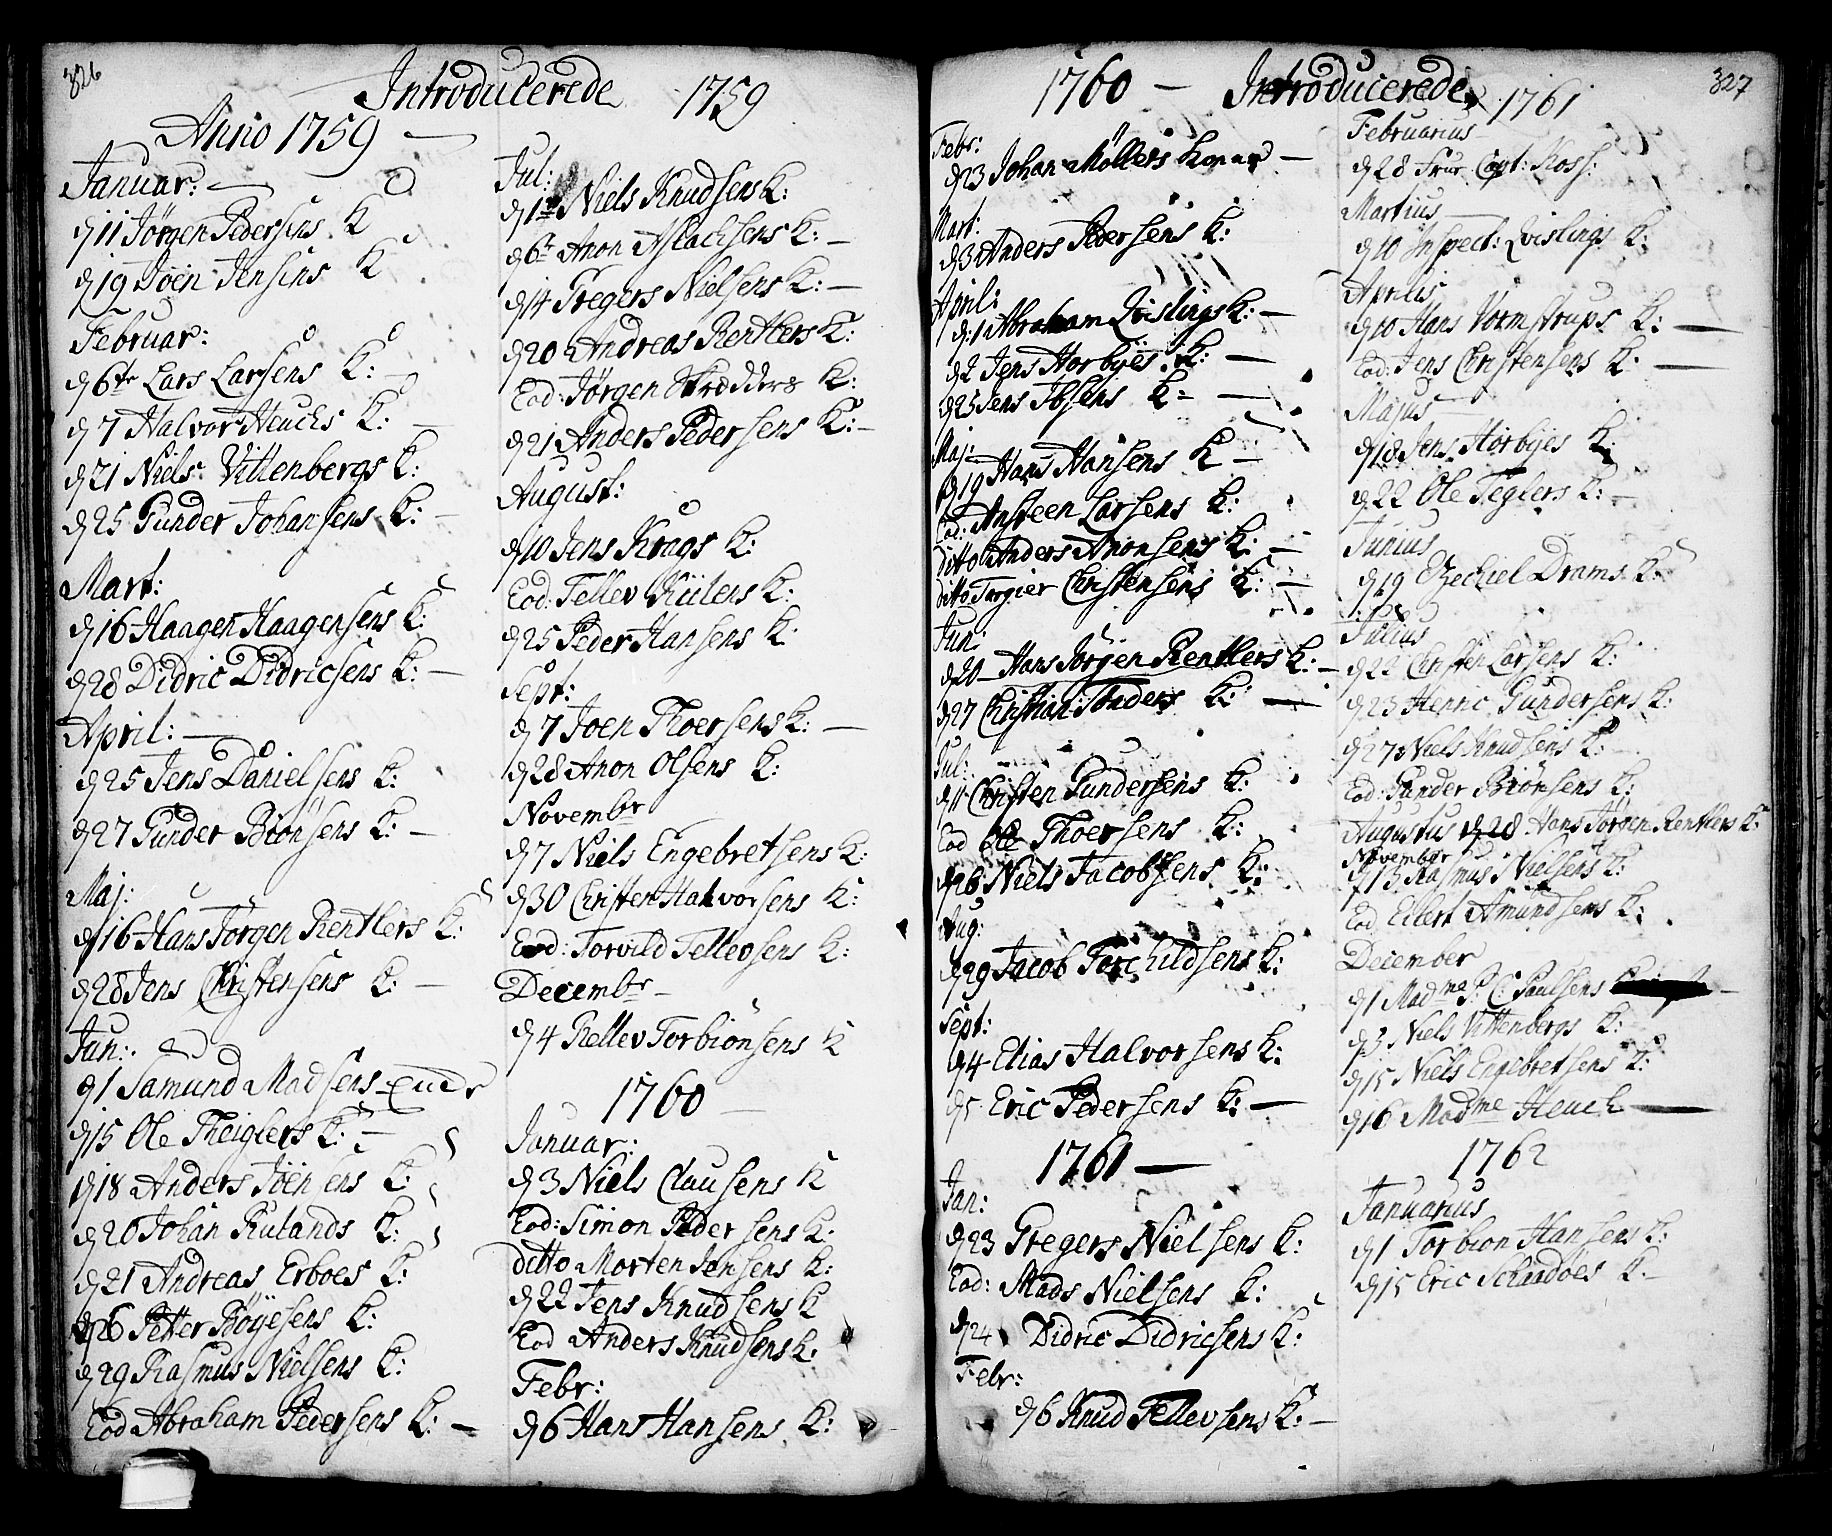 SAKO, Kragerø kirkebøker, F/Fa/L0001: Ministerialbok nr. 1, 1702-1766, s. 326-327